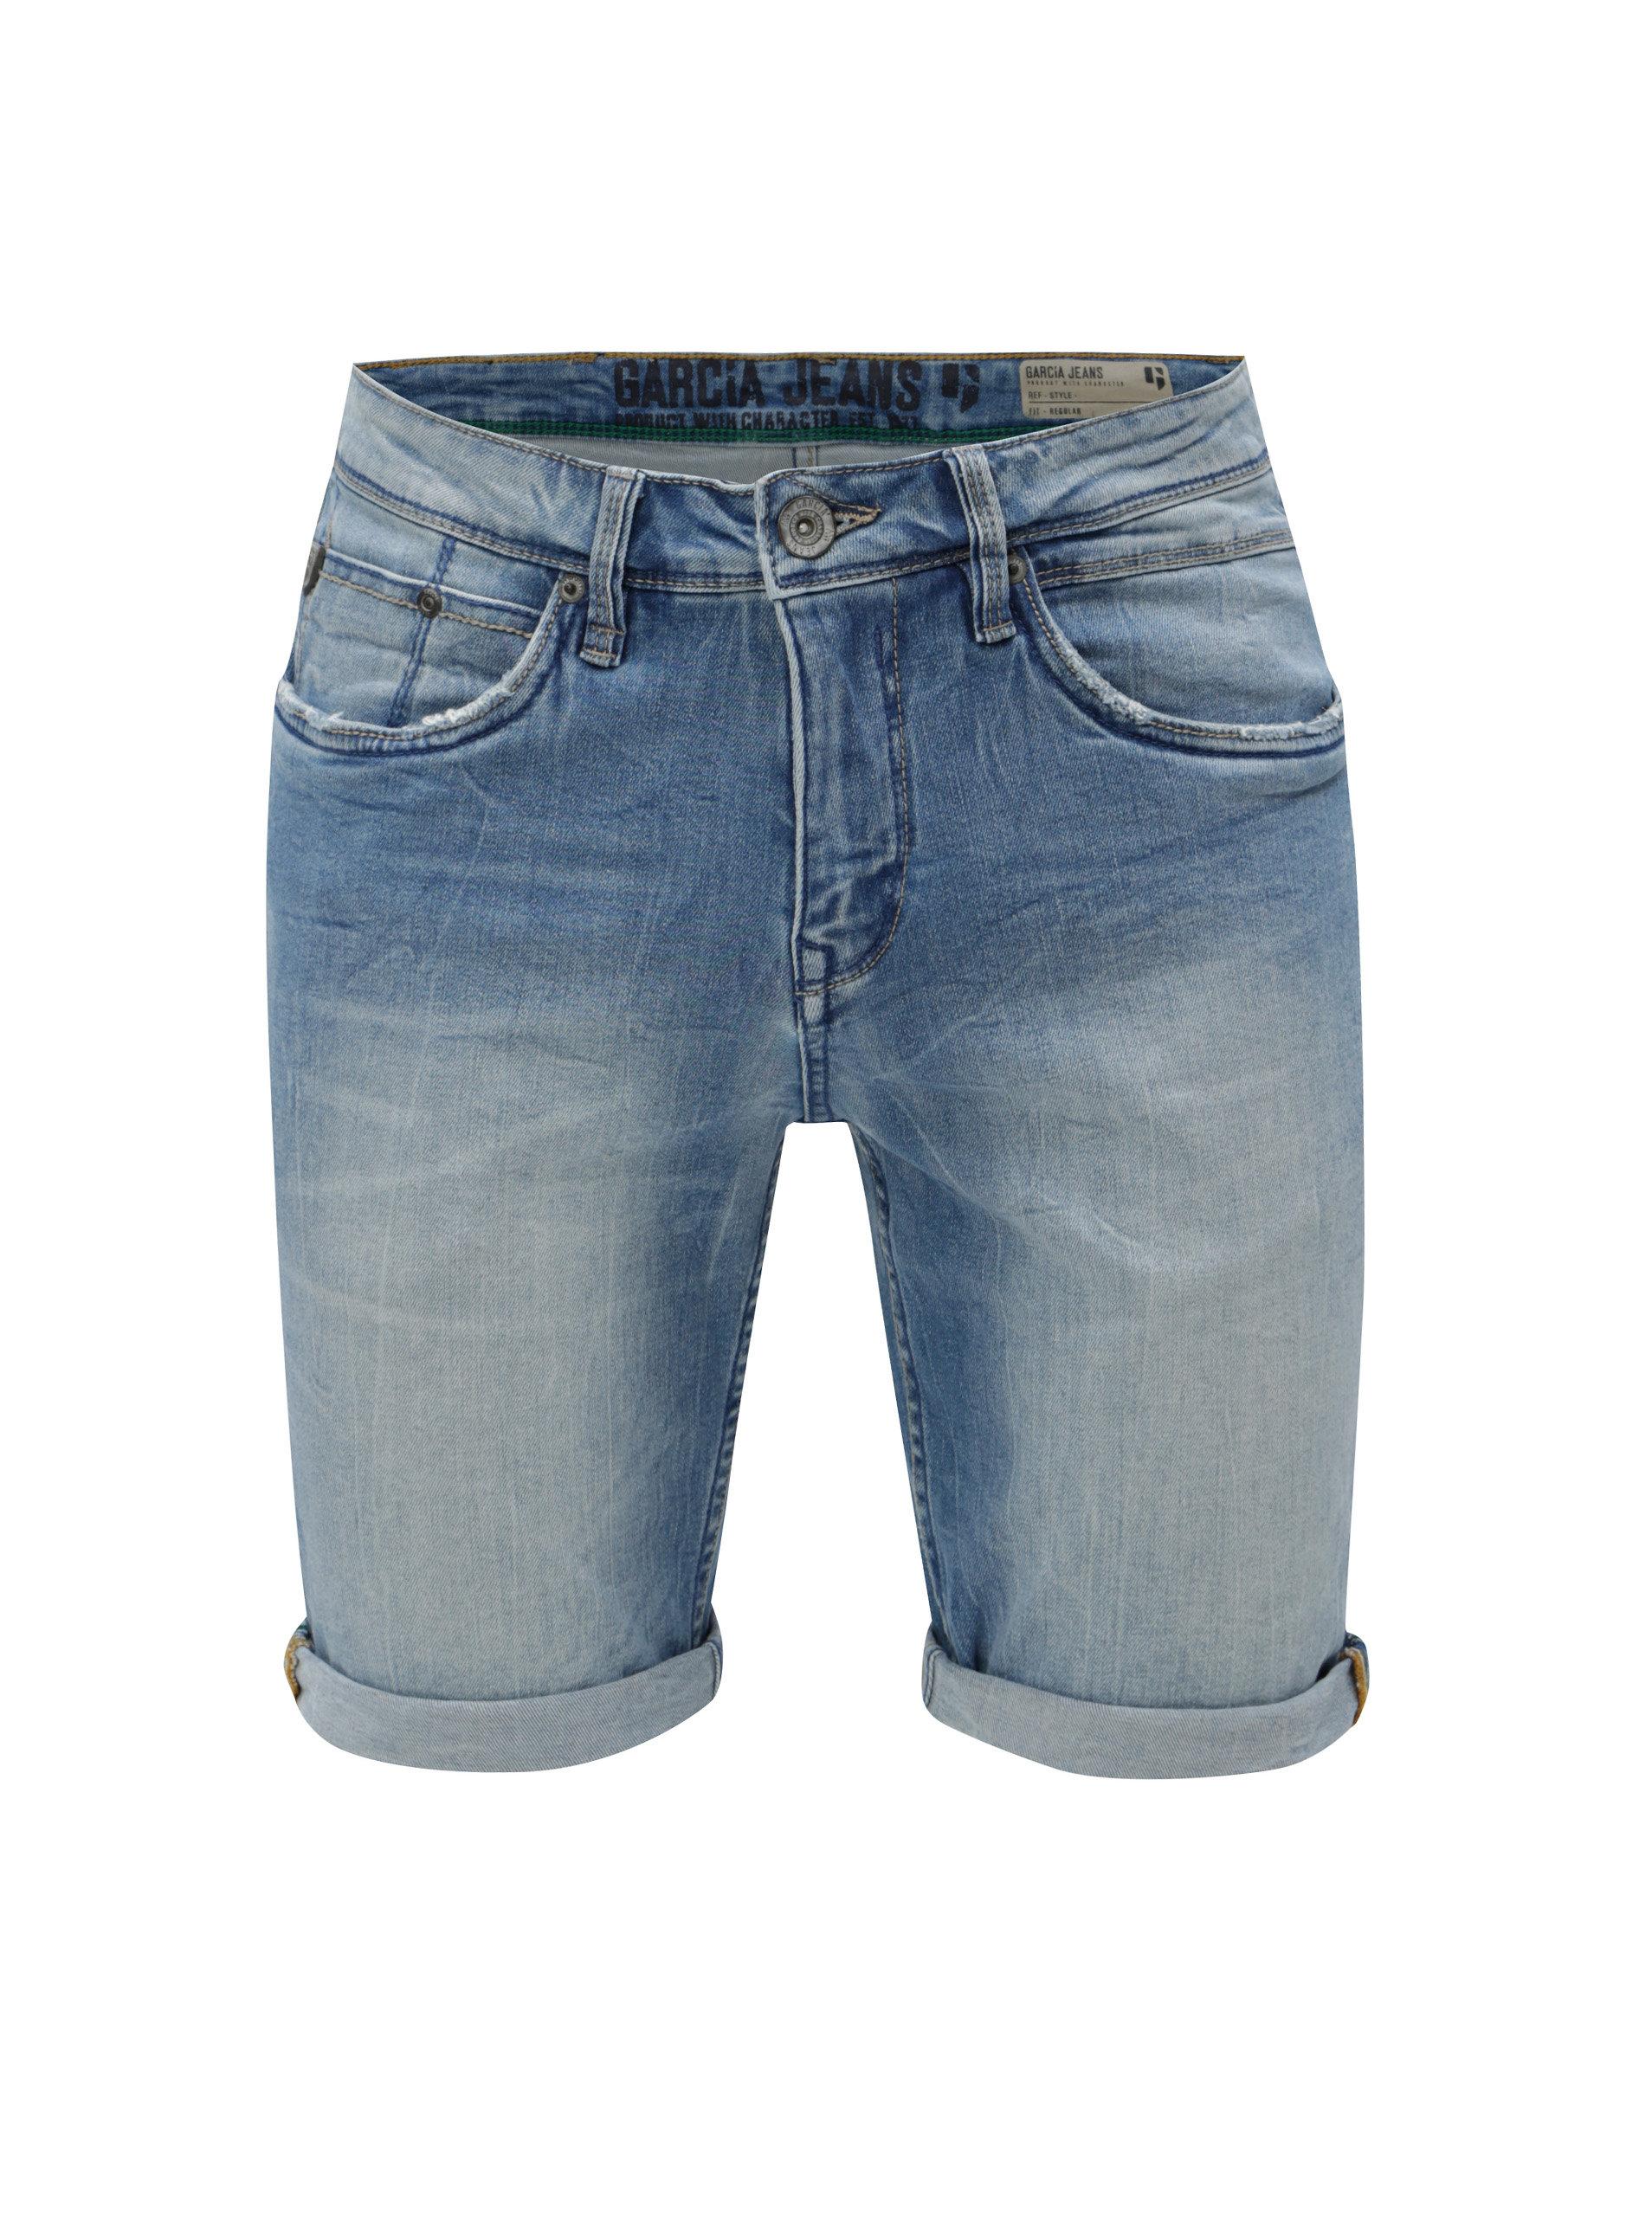 Modré pánské džínové kraťasy s vyšisovaným efektem Garcia Jeans ... 328591b43c